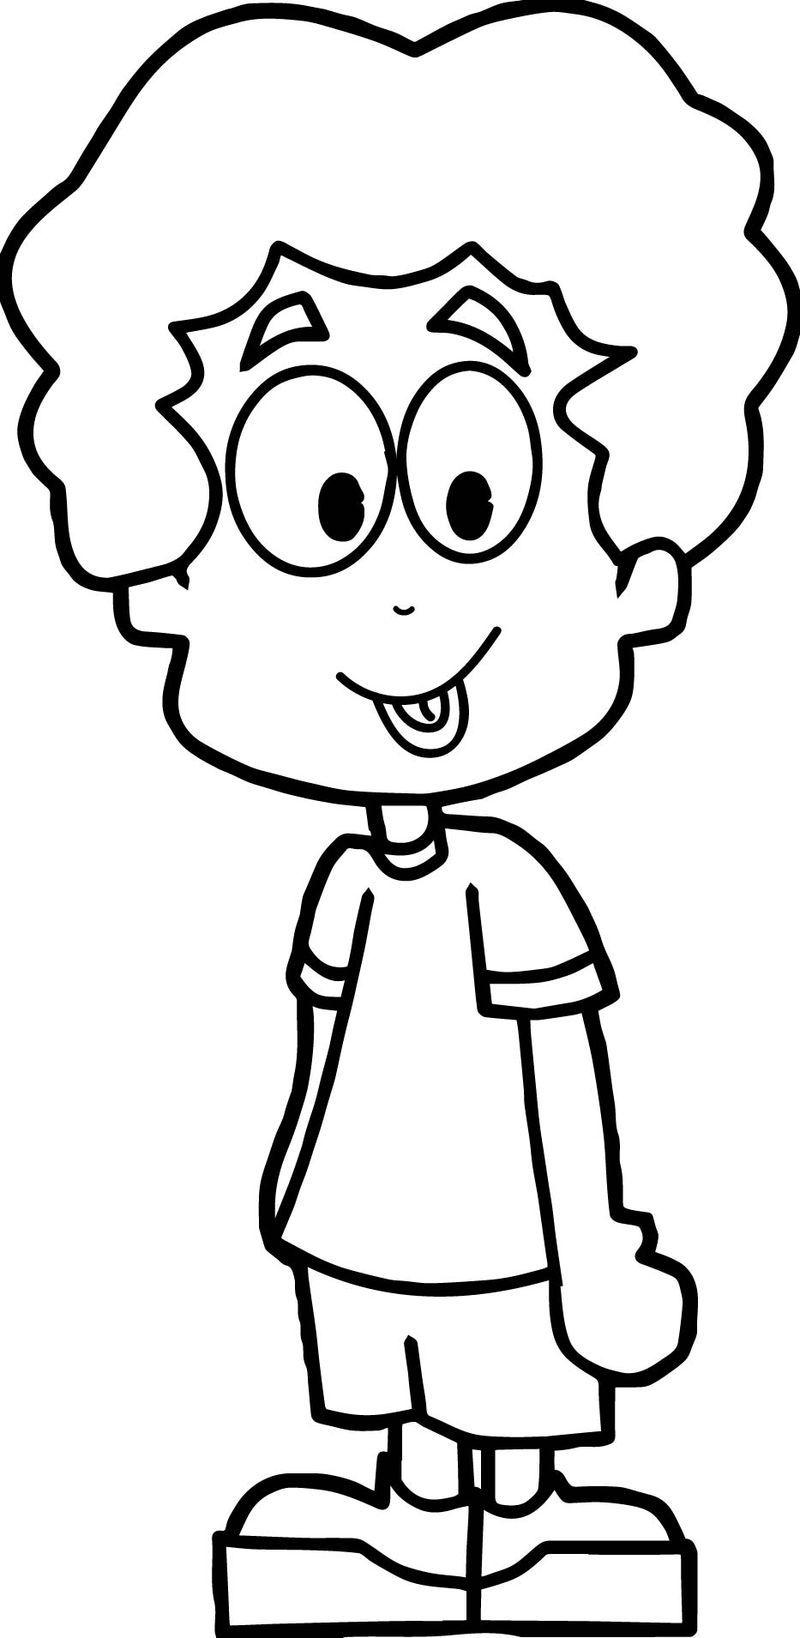 Pin On Cartoon Coloring